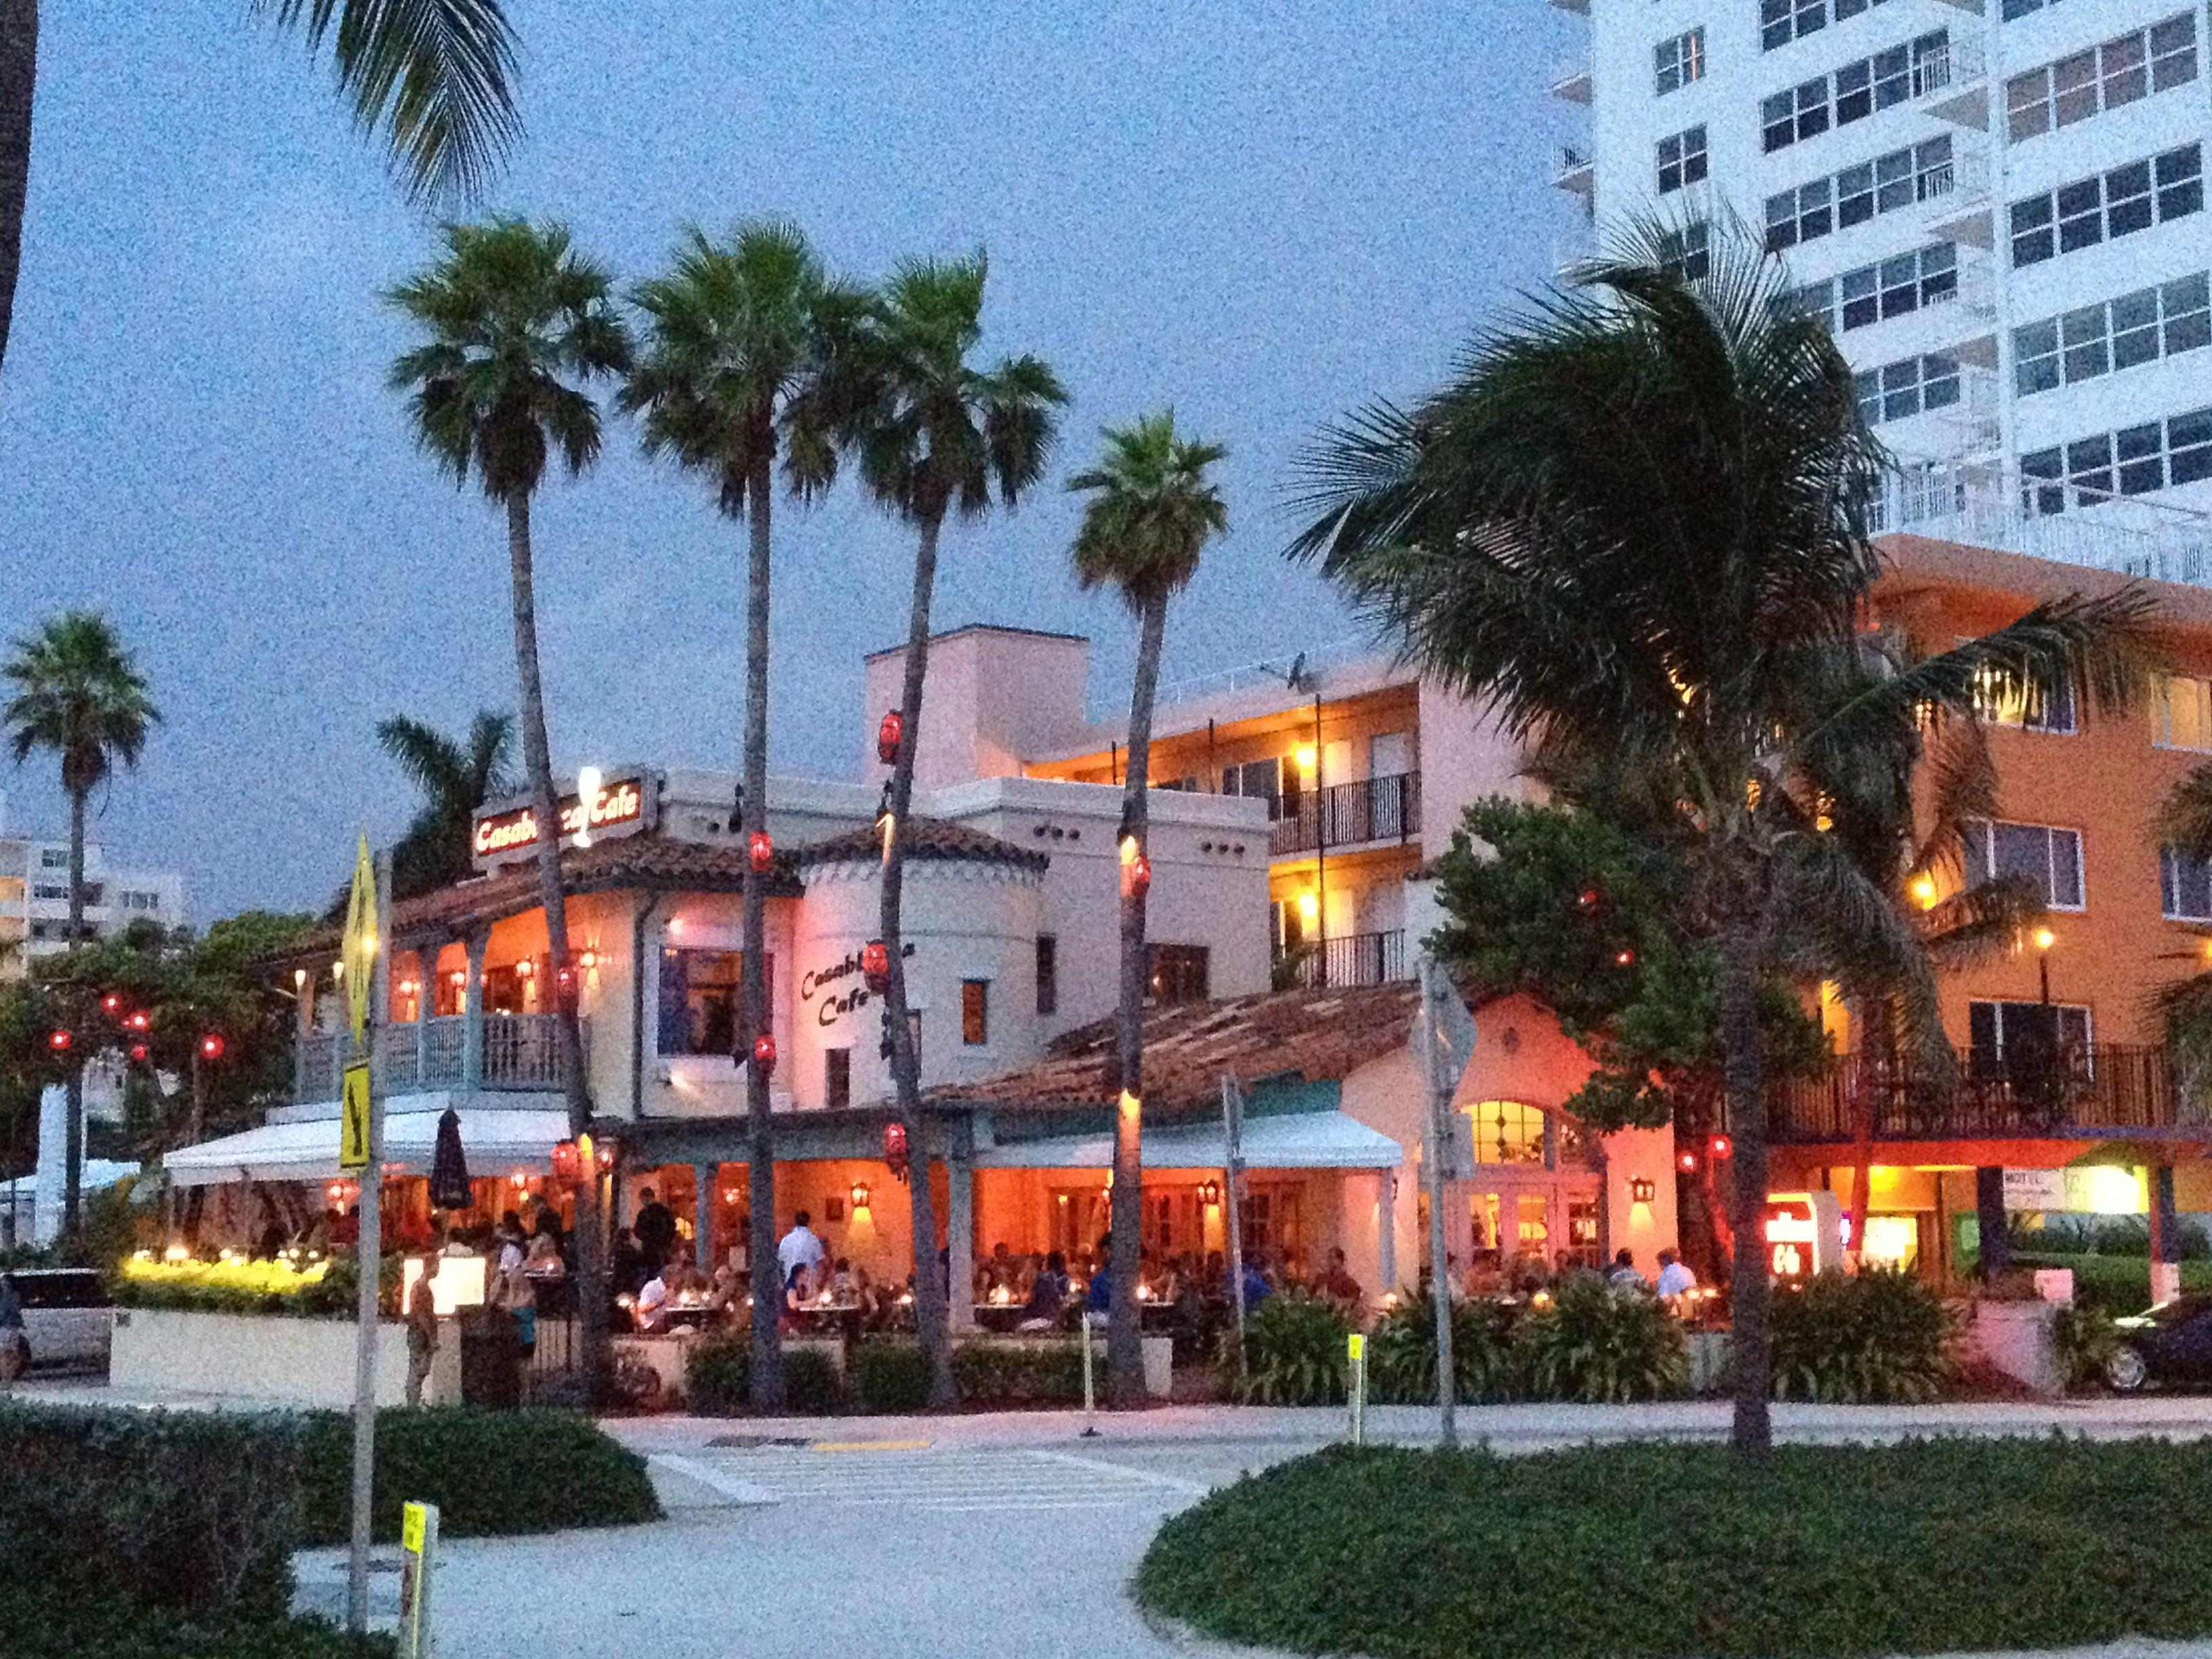 Casablanca Cafe Fort Lauderdale Florida